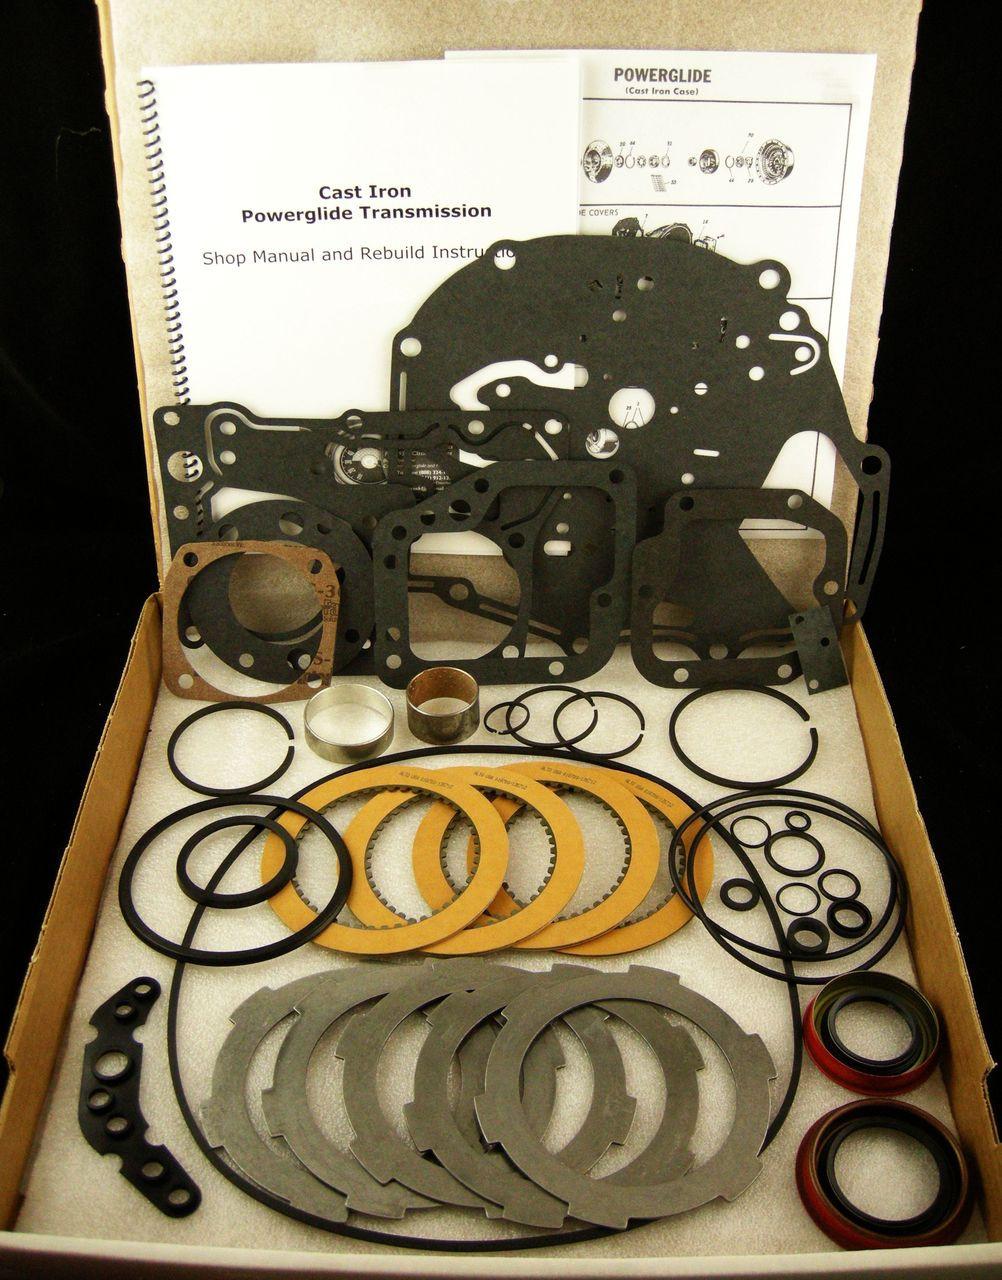 medium resolution of cast iron powerglide master rebuild kit 1958 1959 1960